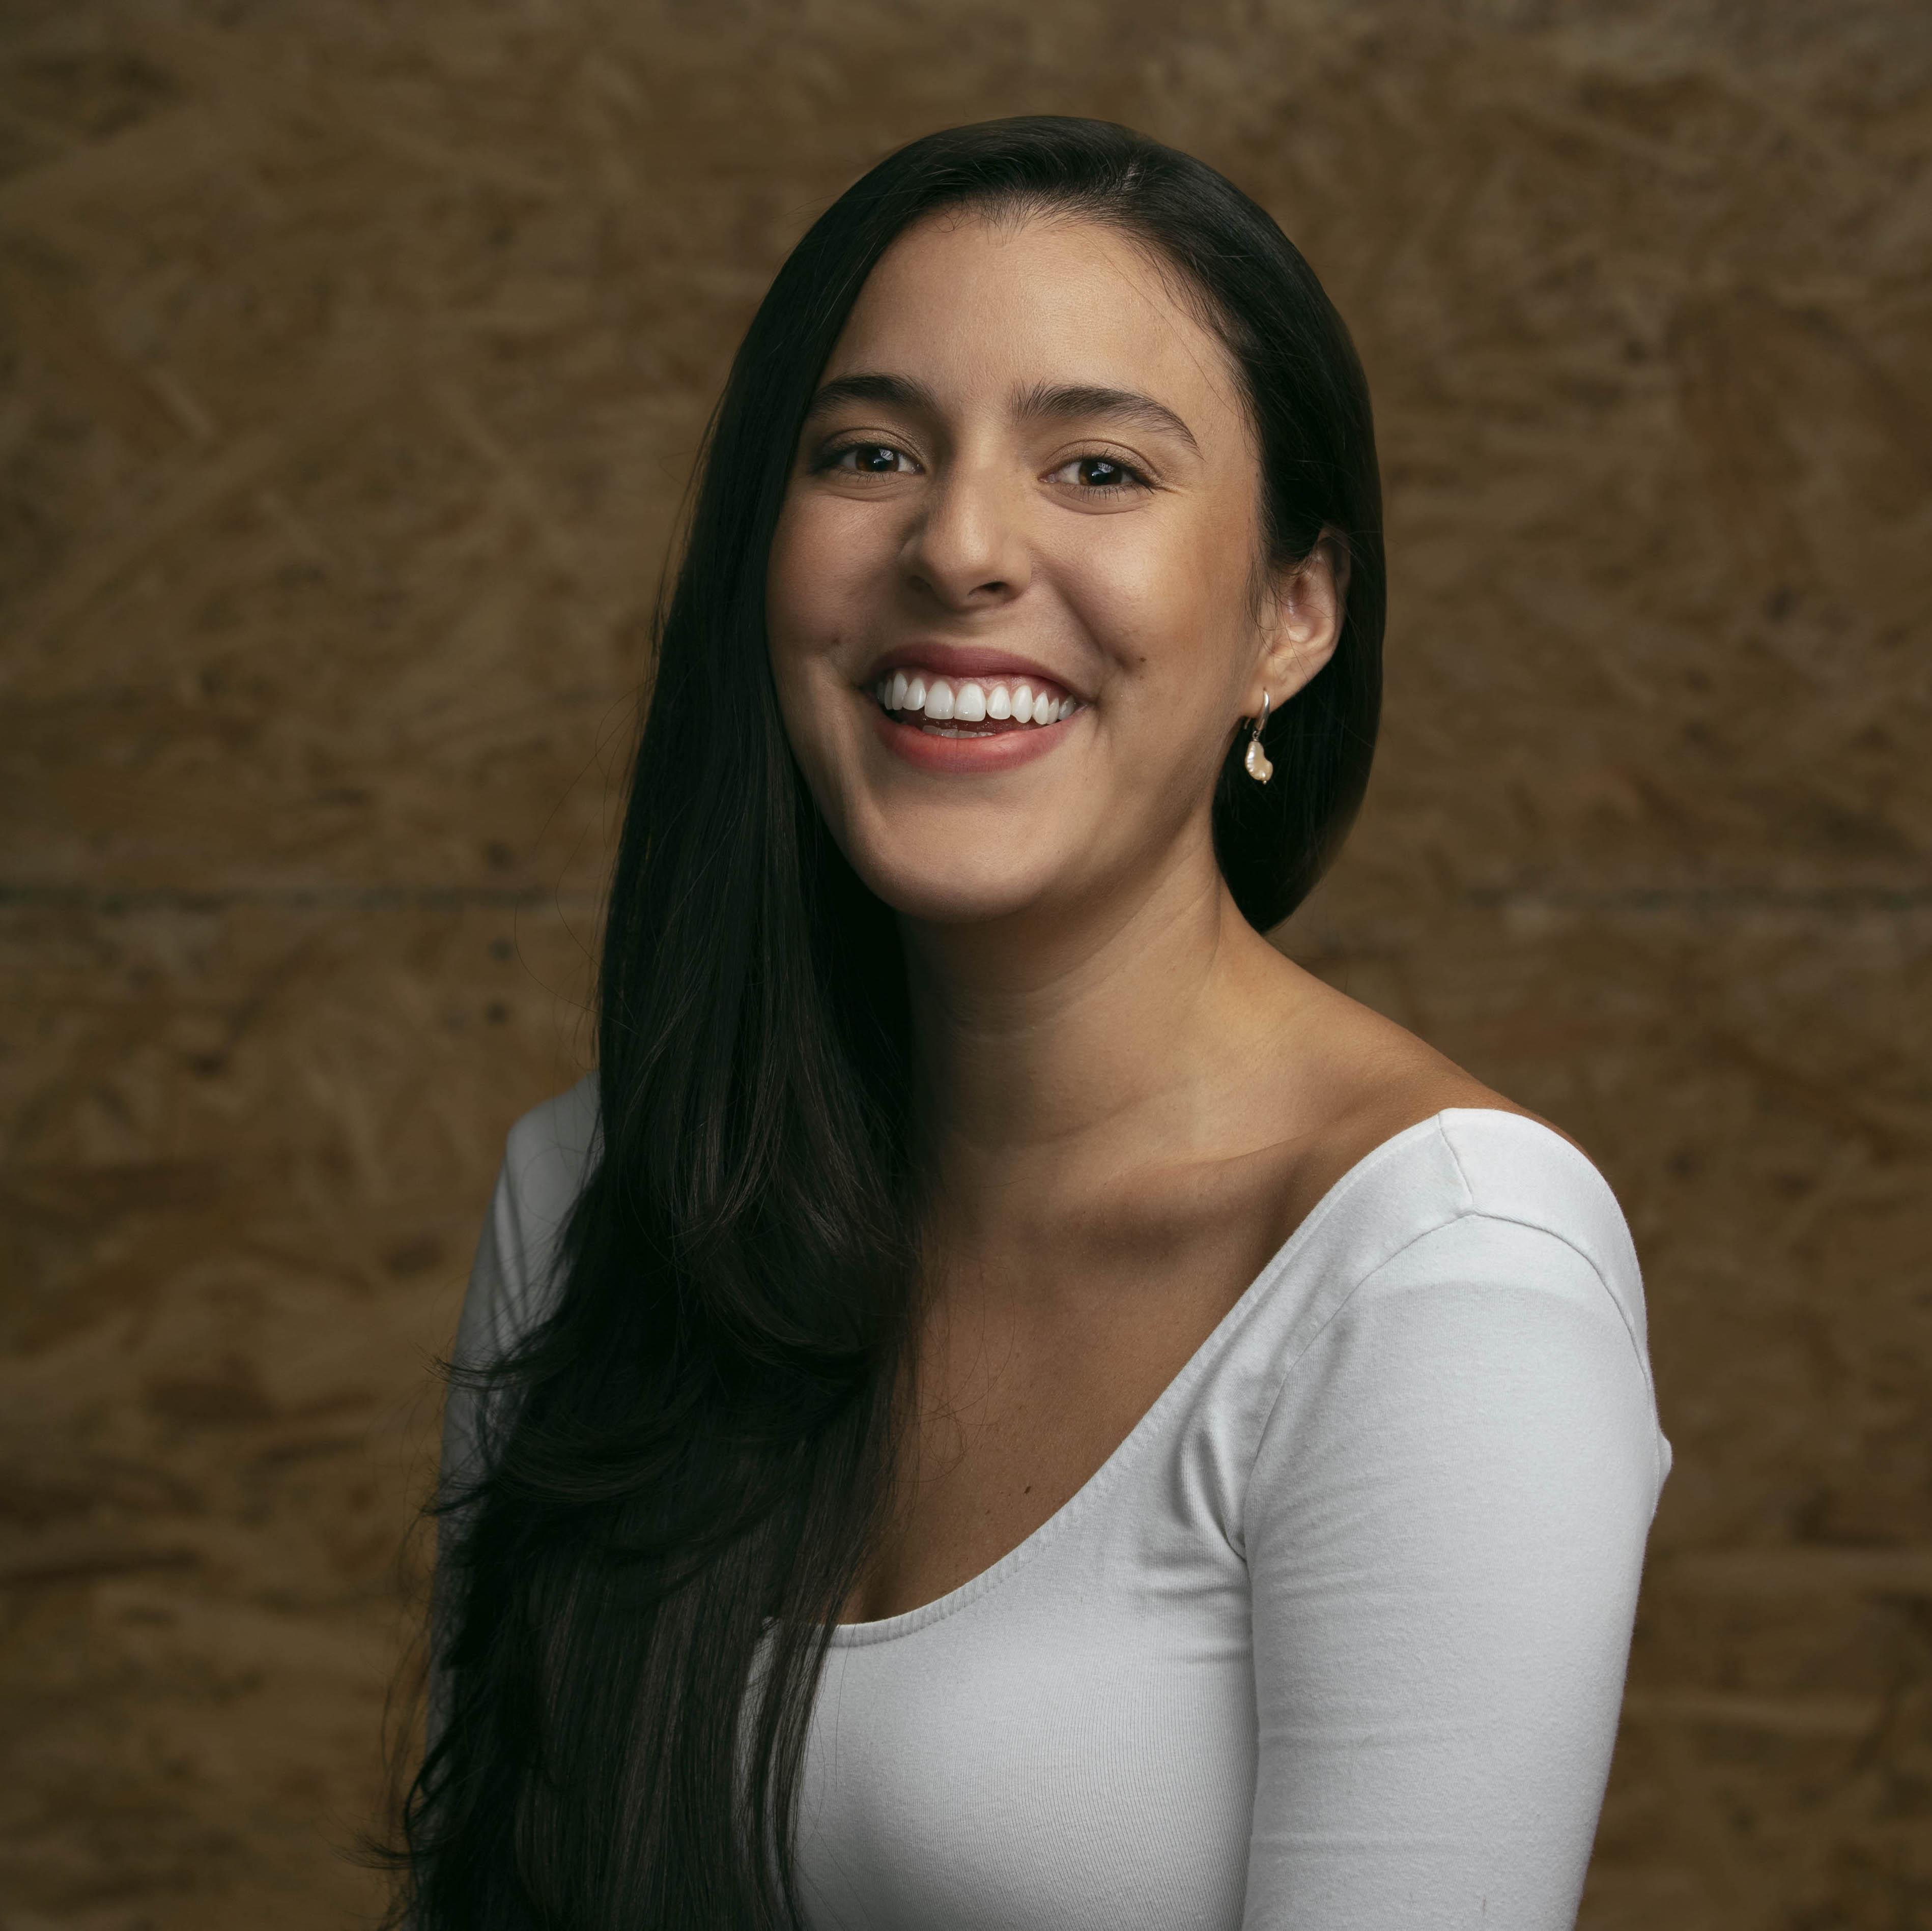 Mónica Hidalgo Reynolds